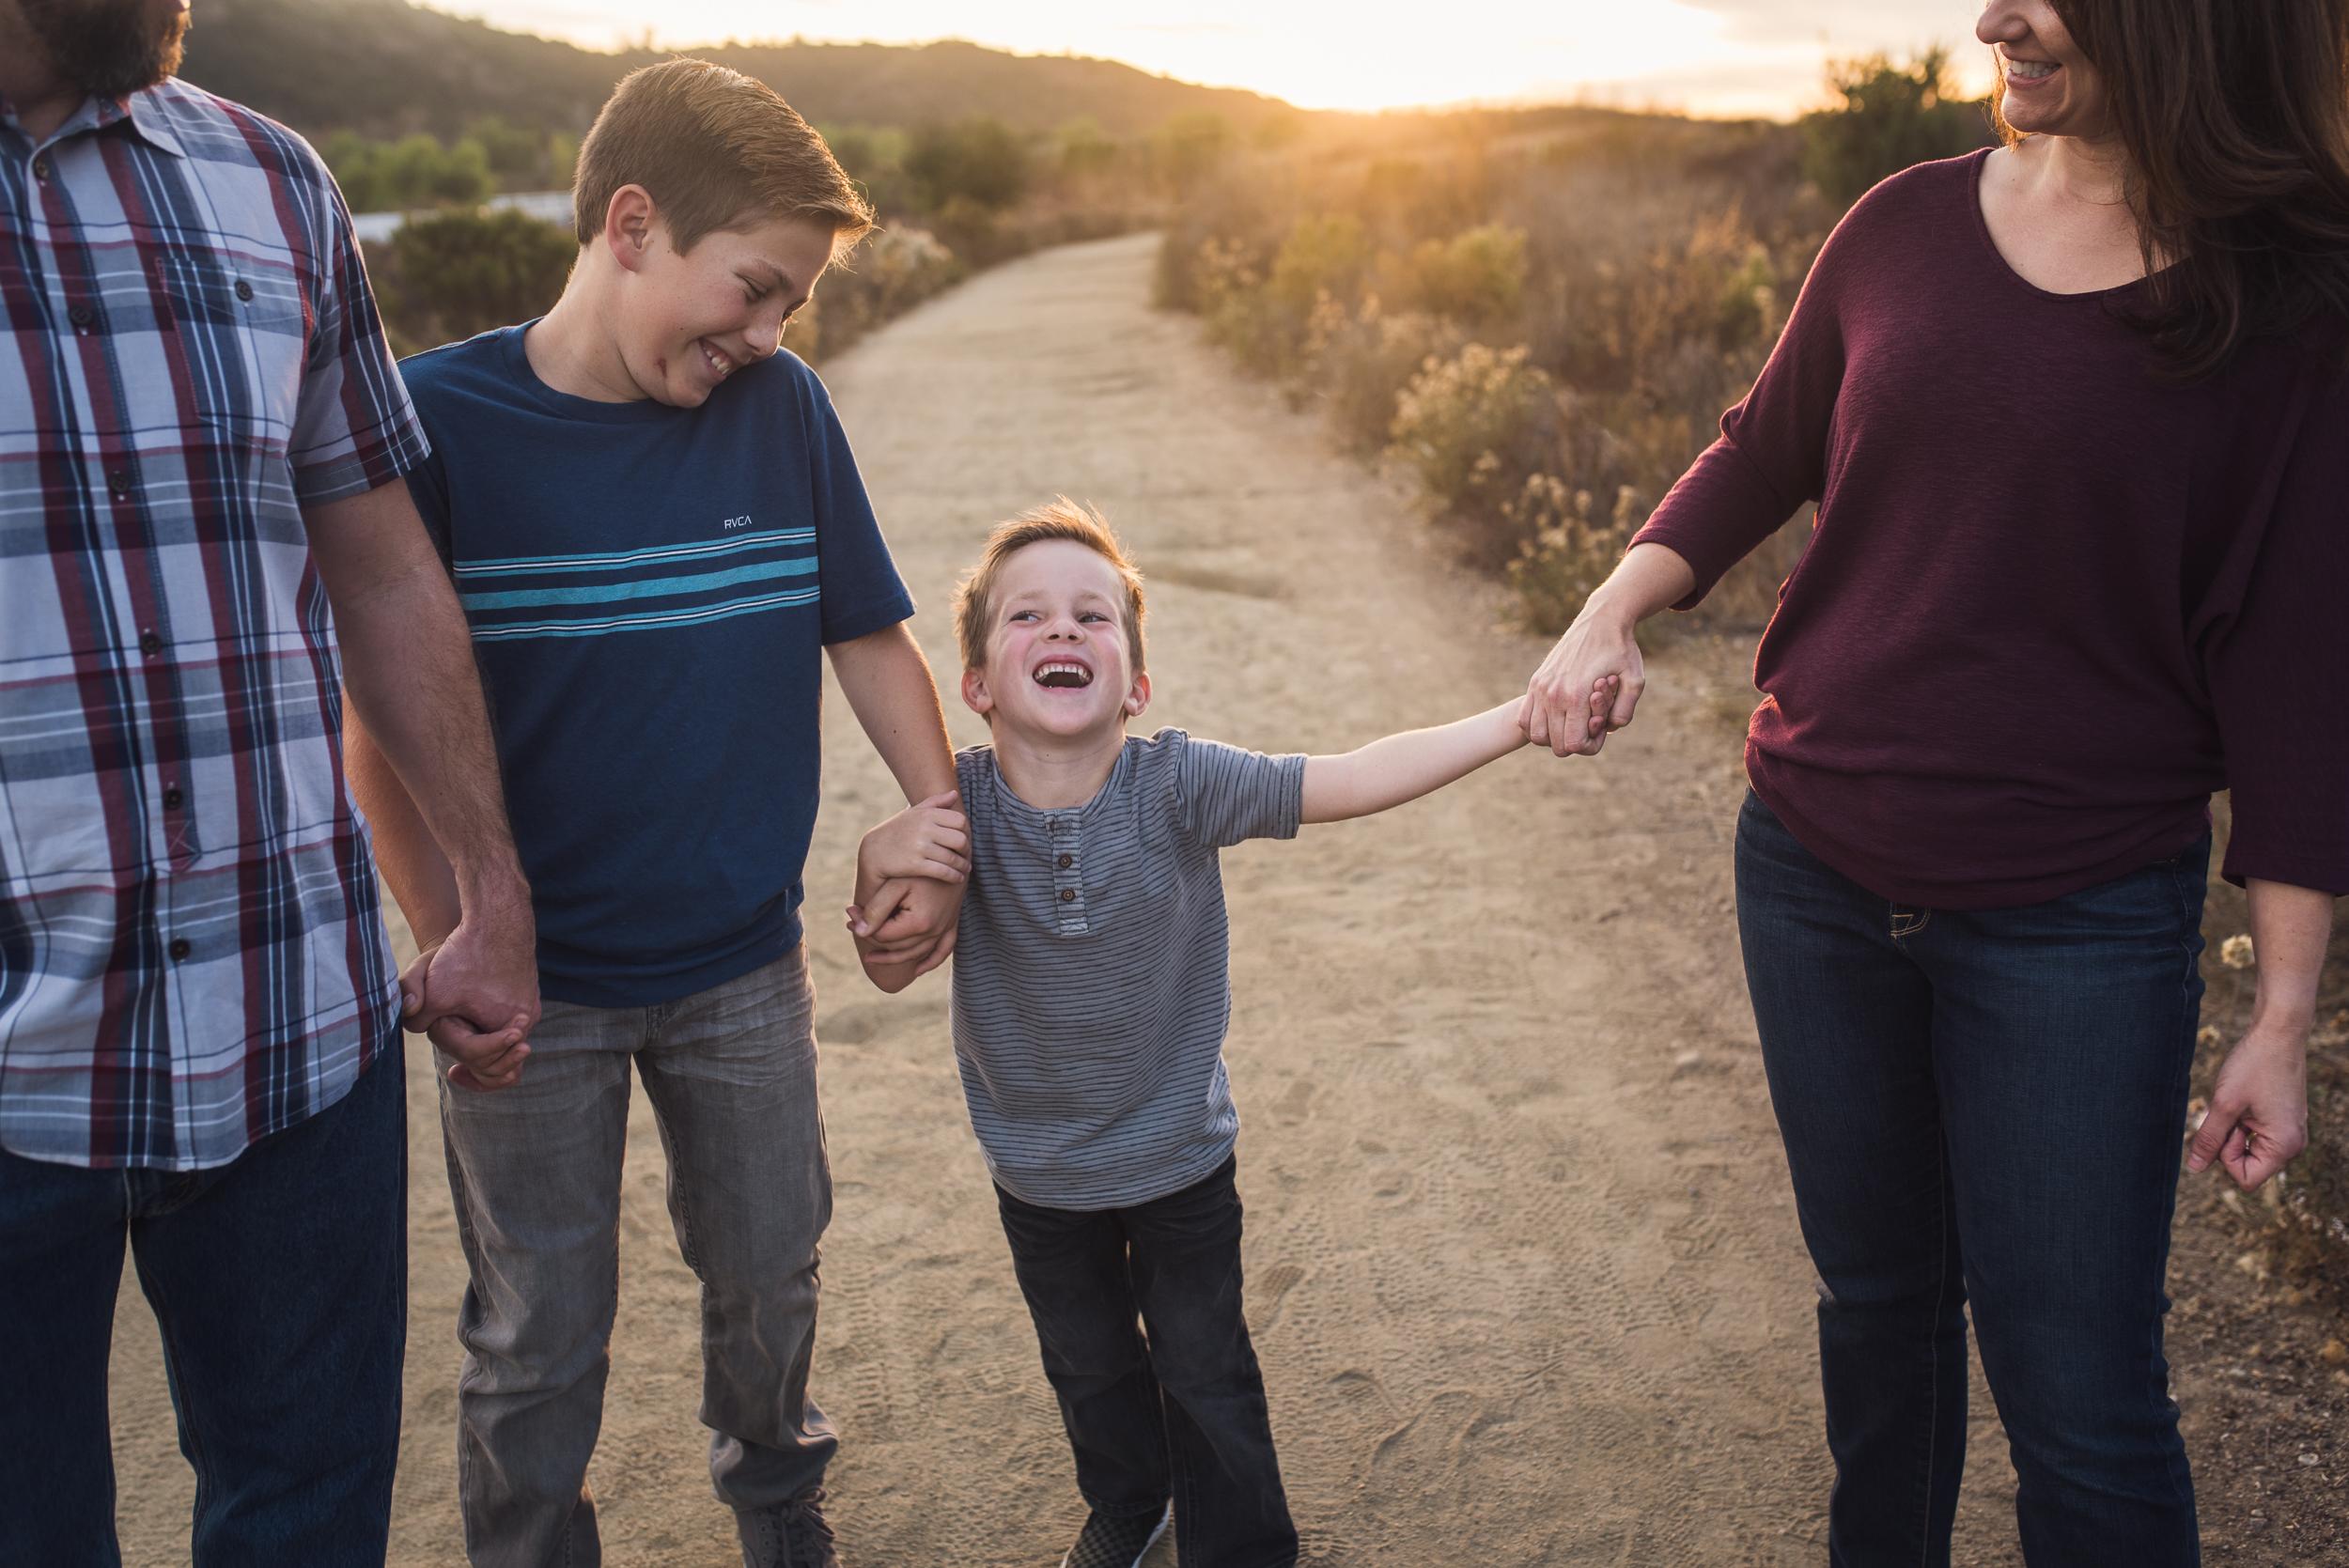 2018-San-Diego-Family-Lifestyle-Newborn-Travel-Vacation-Photographer-Kelsey-Smith-Photography-Coronado-La-Jolla-Encinitas-Solana-Beach-Del-Mar-78.jpg